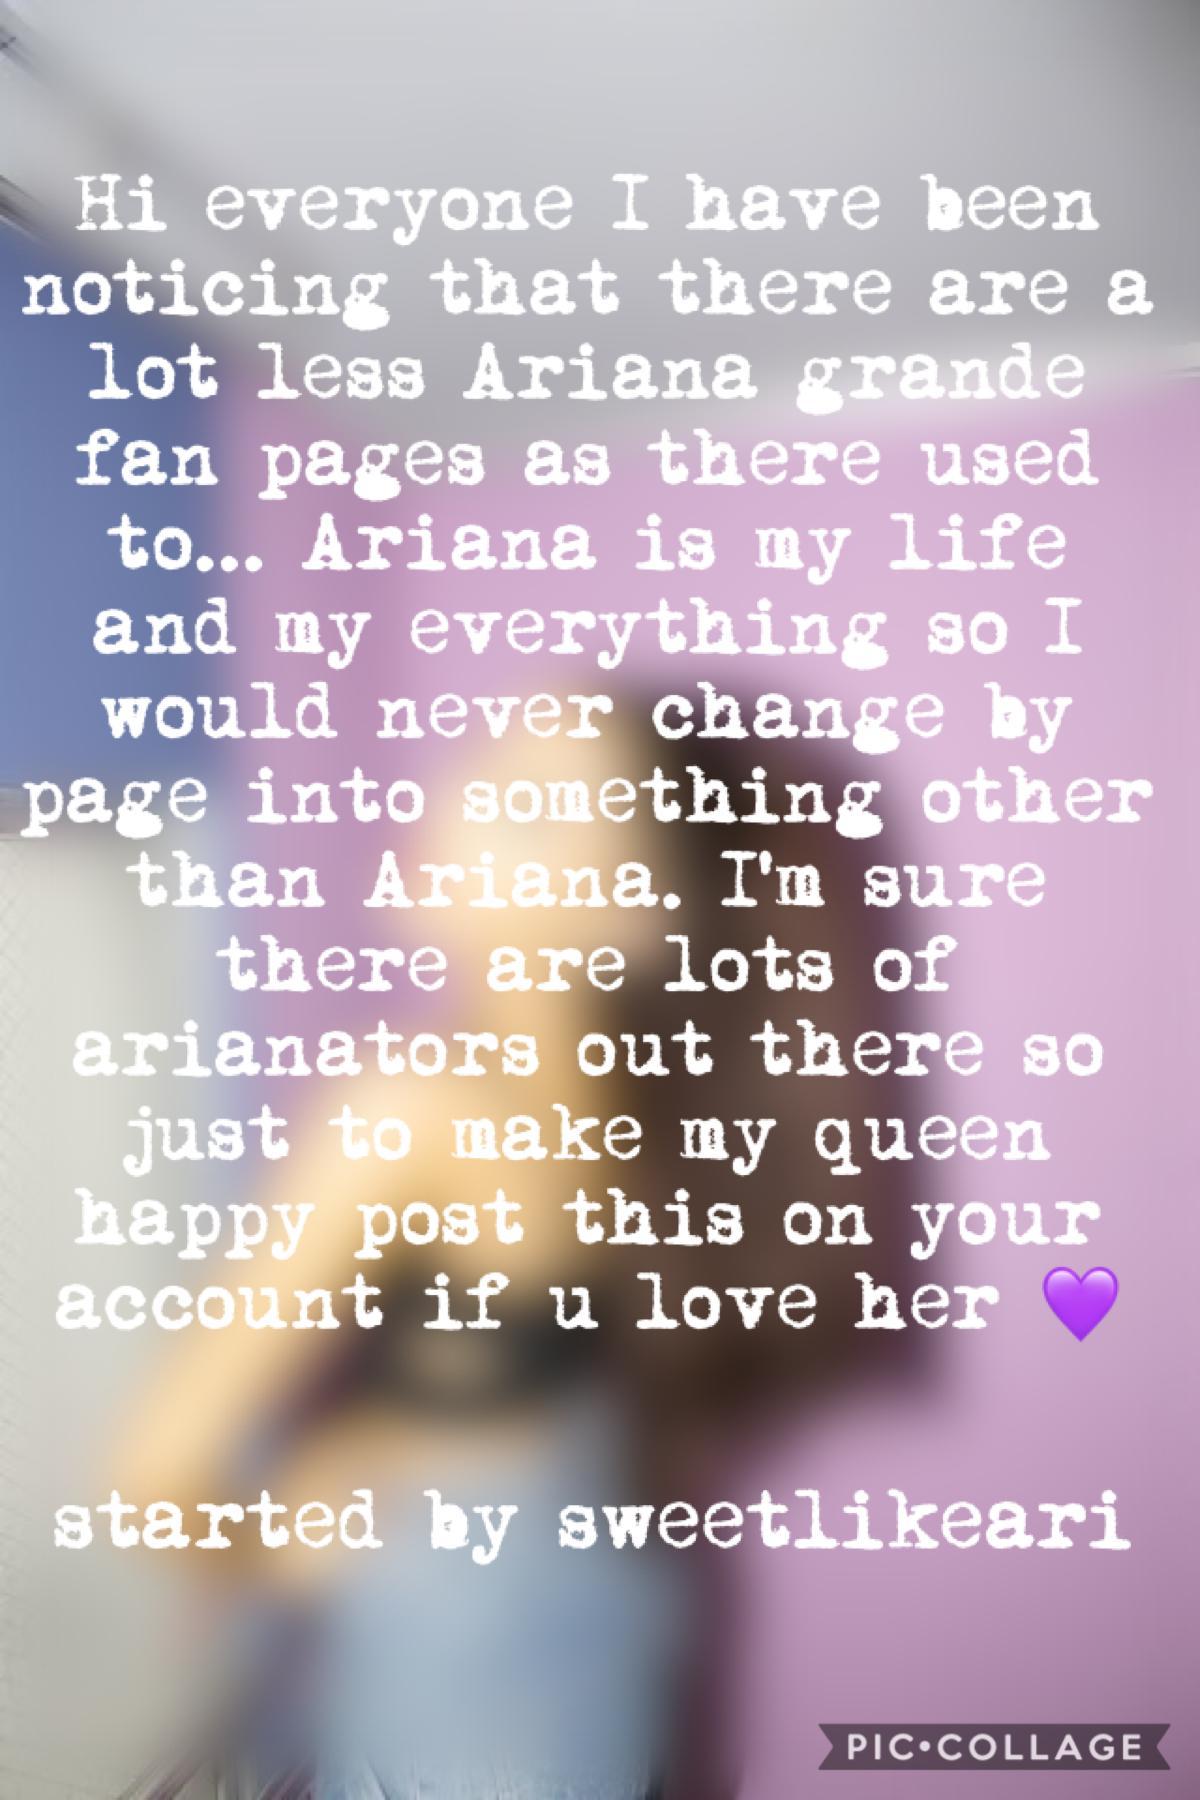 Please repost 💜  Ariana is my life, my everything, my queen, my idol, my world, I LOVE HER SOOOO MUCHHHH💜🦋